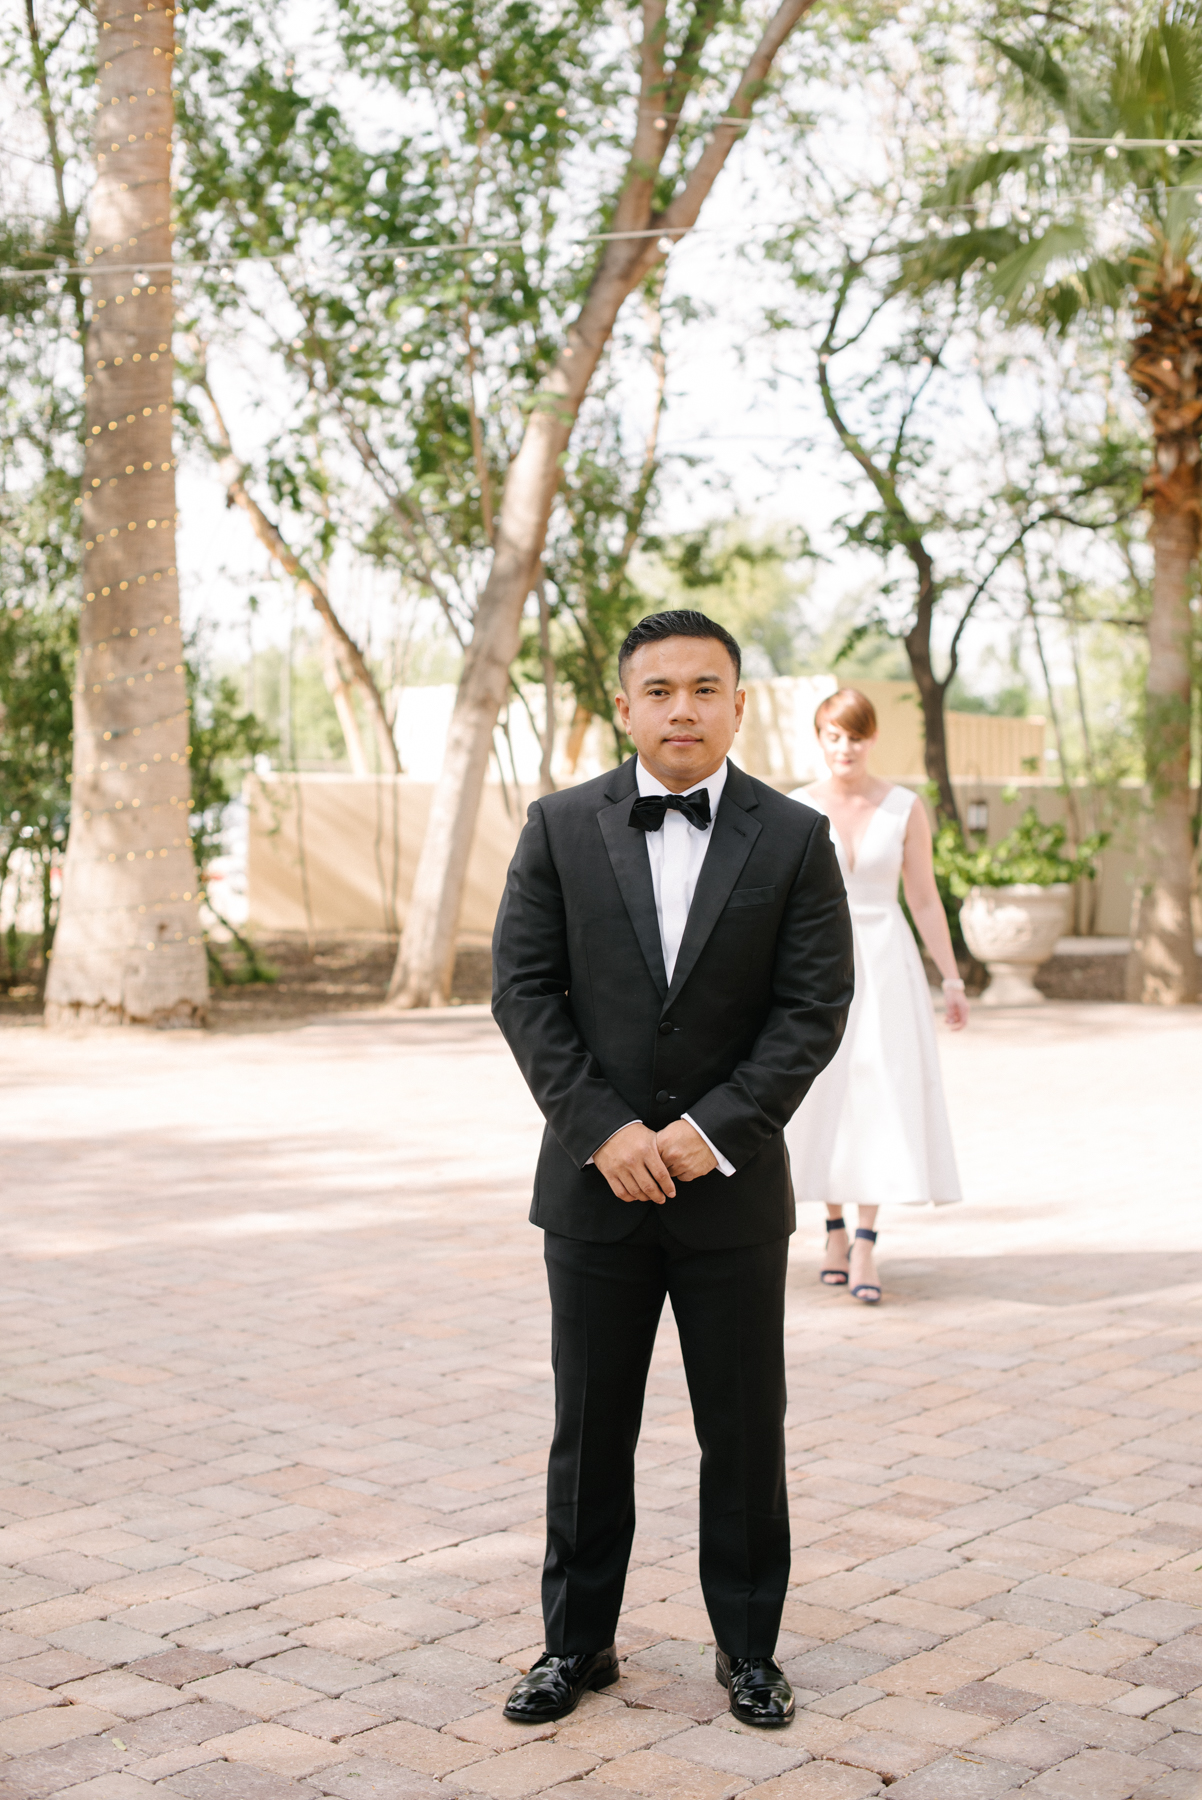 Secret Garden Event Center Wedding - Meredith Amadee Photography-35.jpg